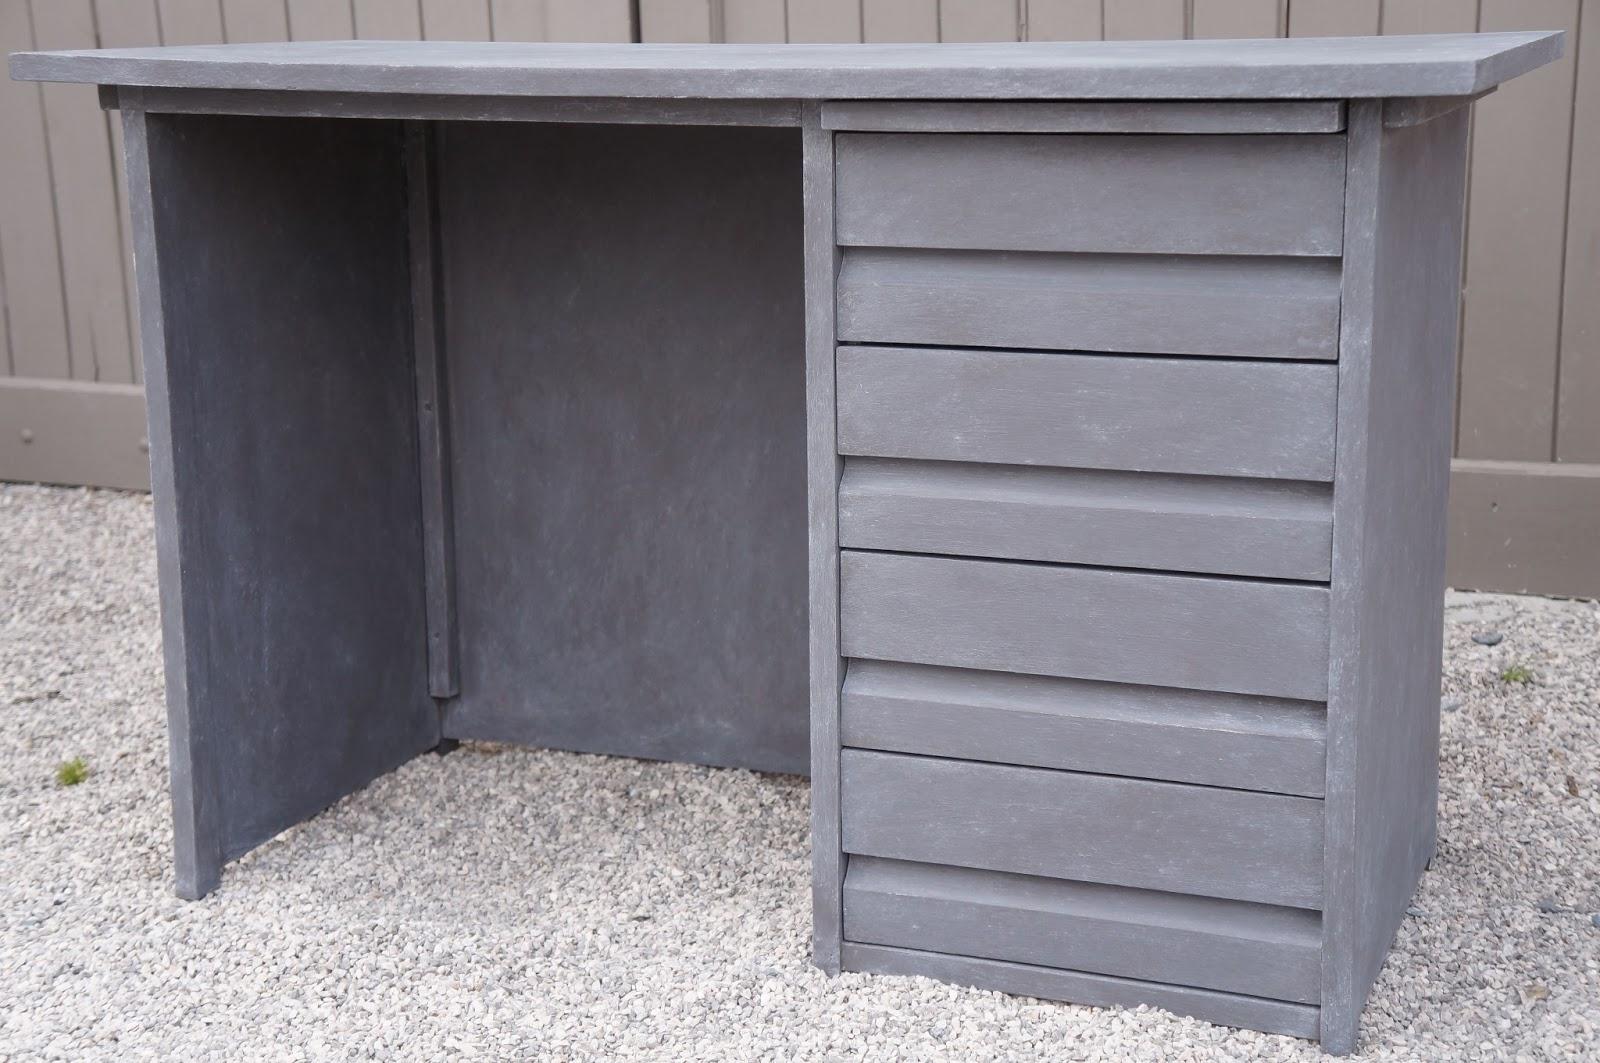 urlu et berlu juillet 2013. Black Bedroom Furniture Sets. Home Design Ideas